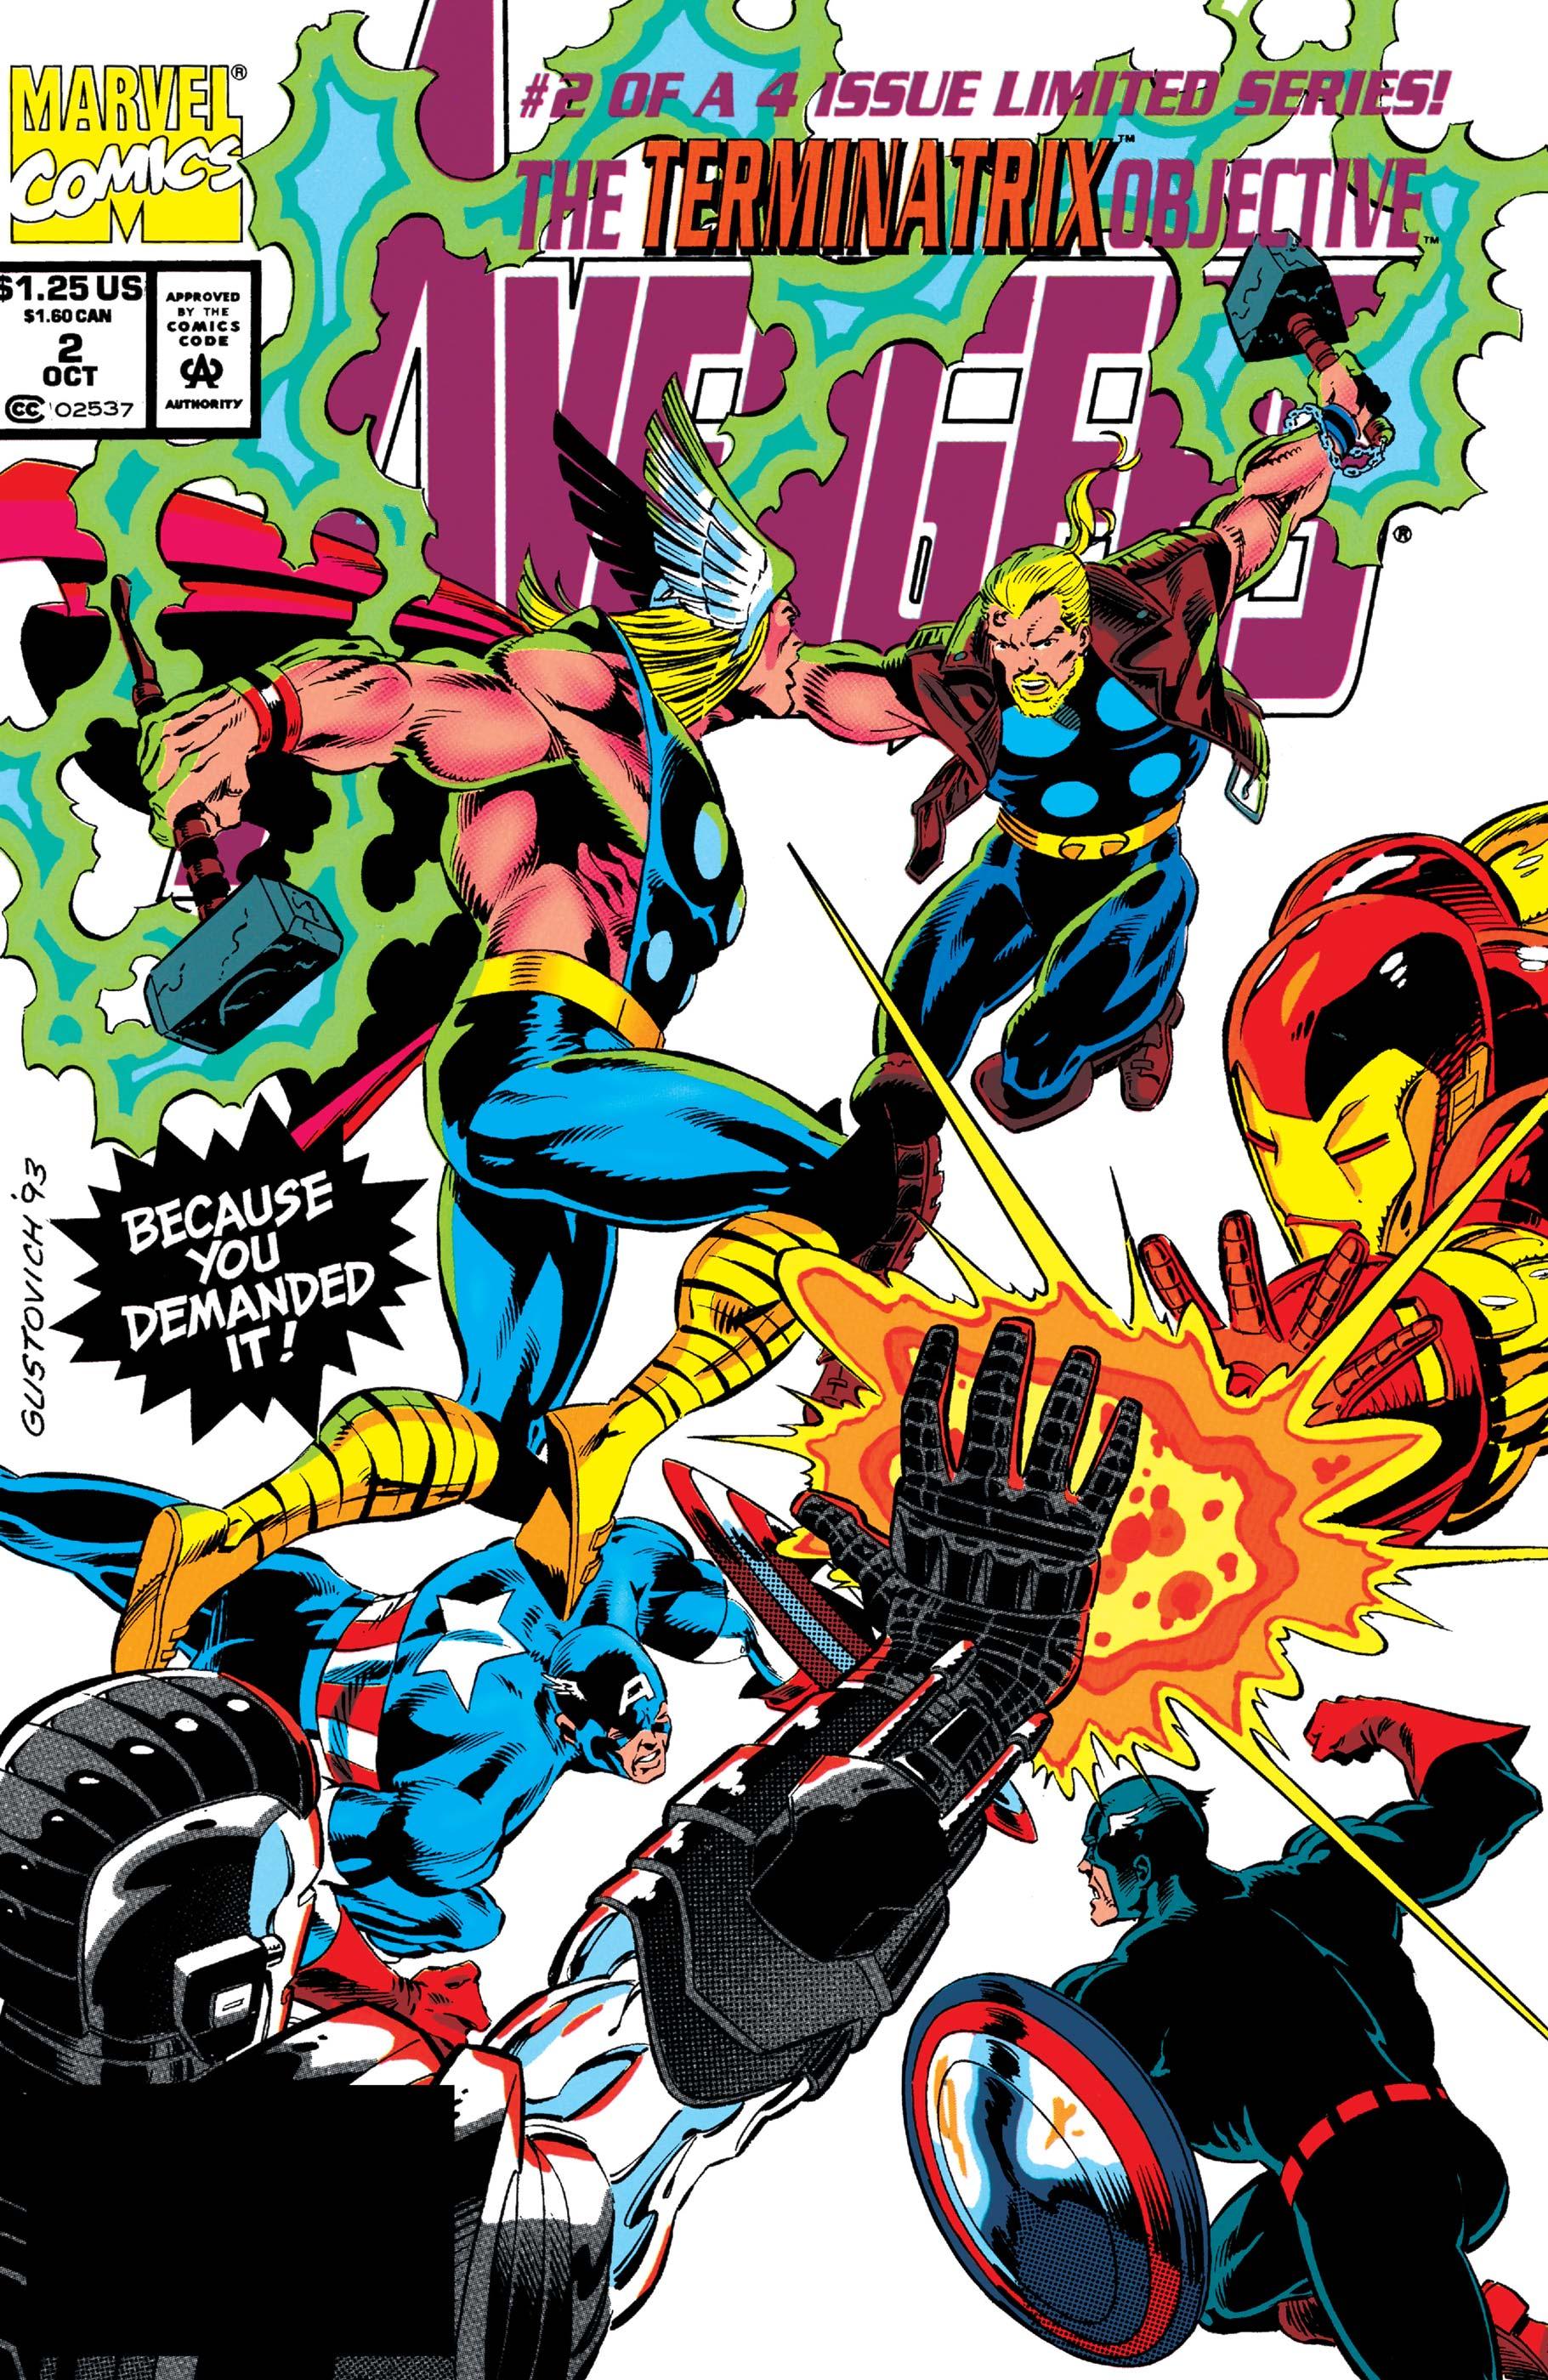 Avengers: The Terminatrix Objective (1993) #2